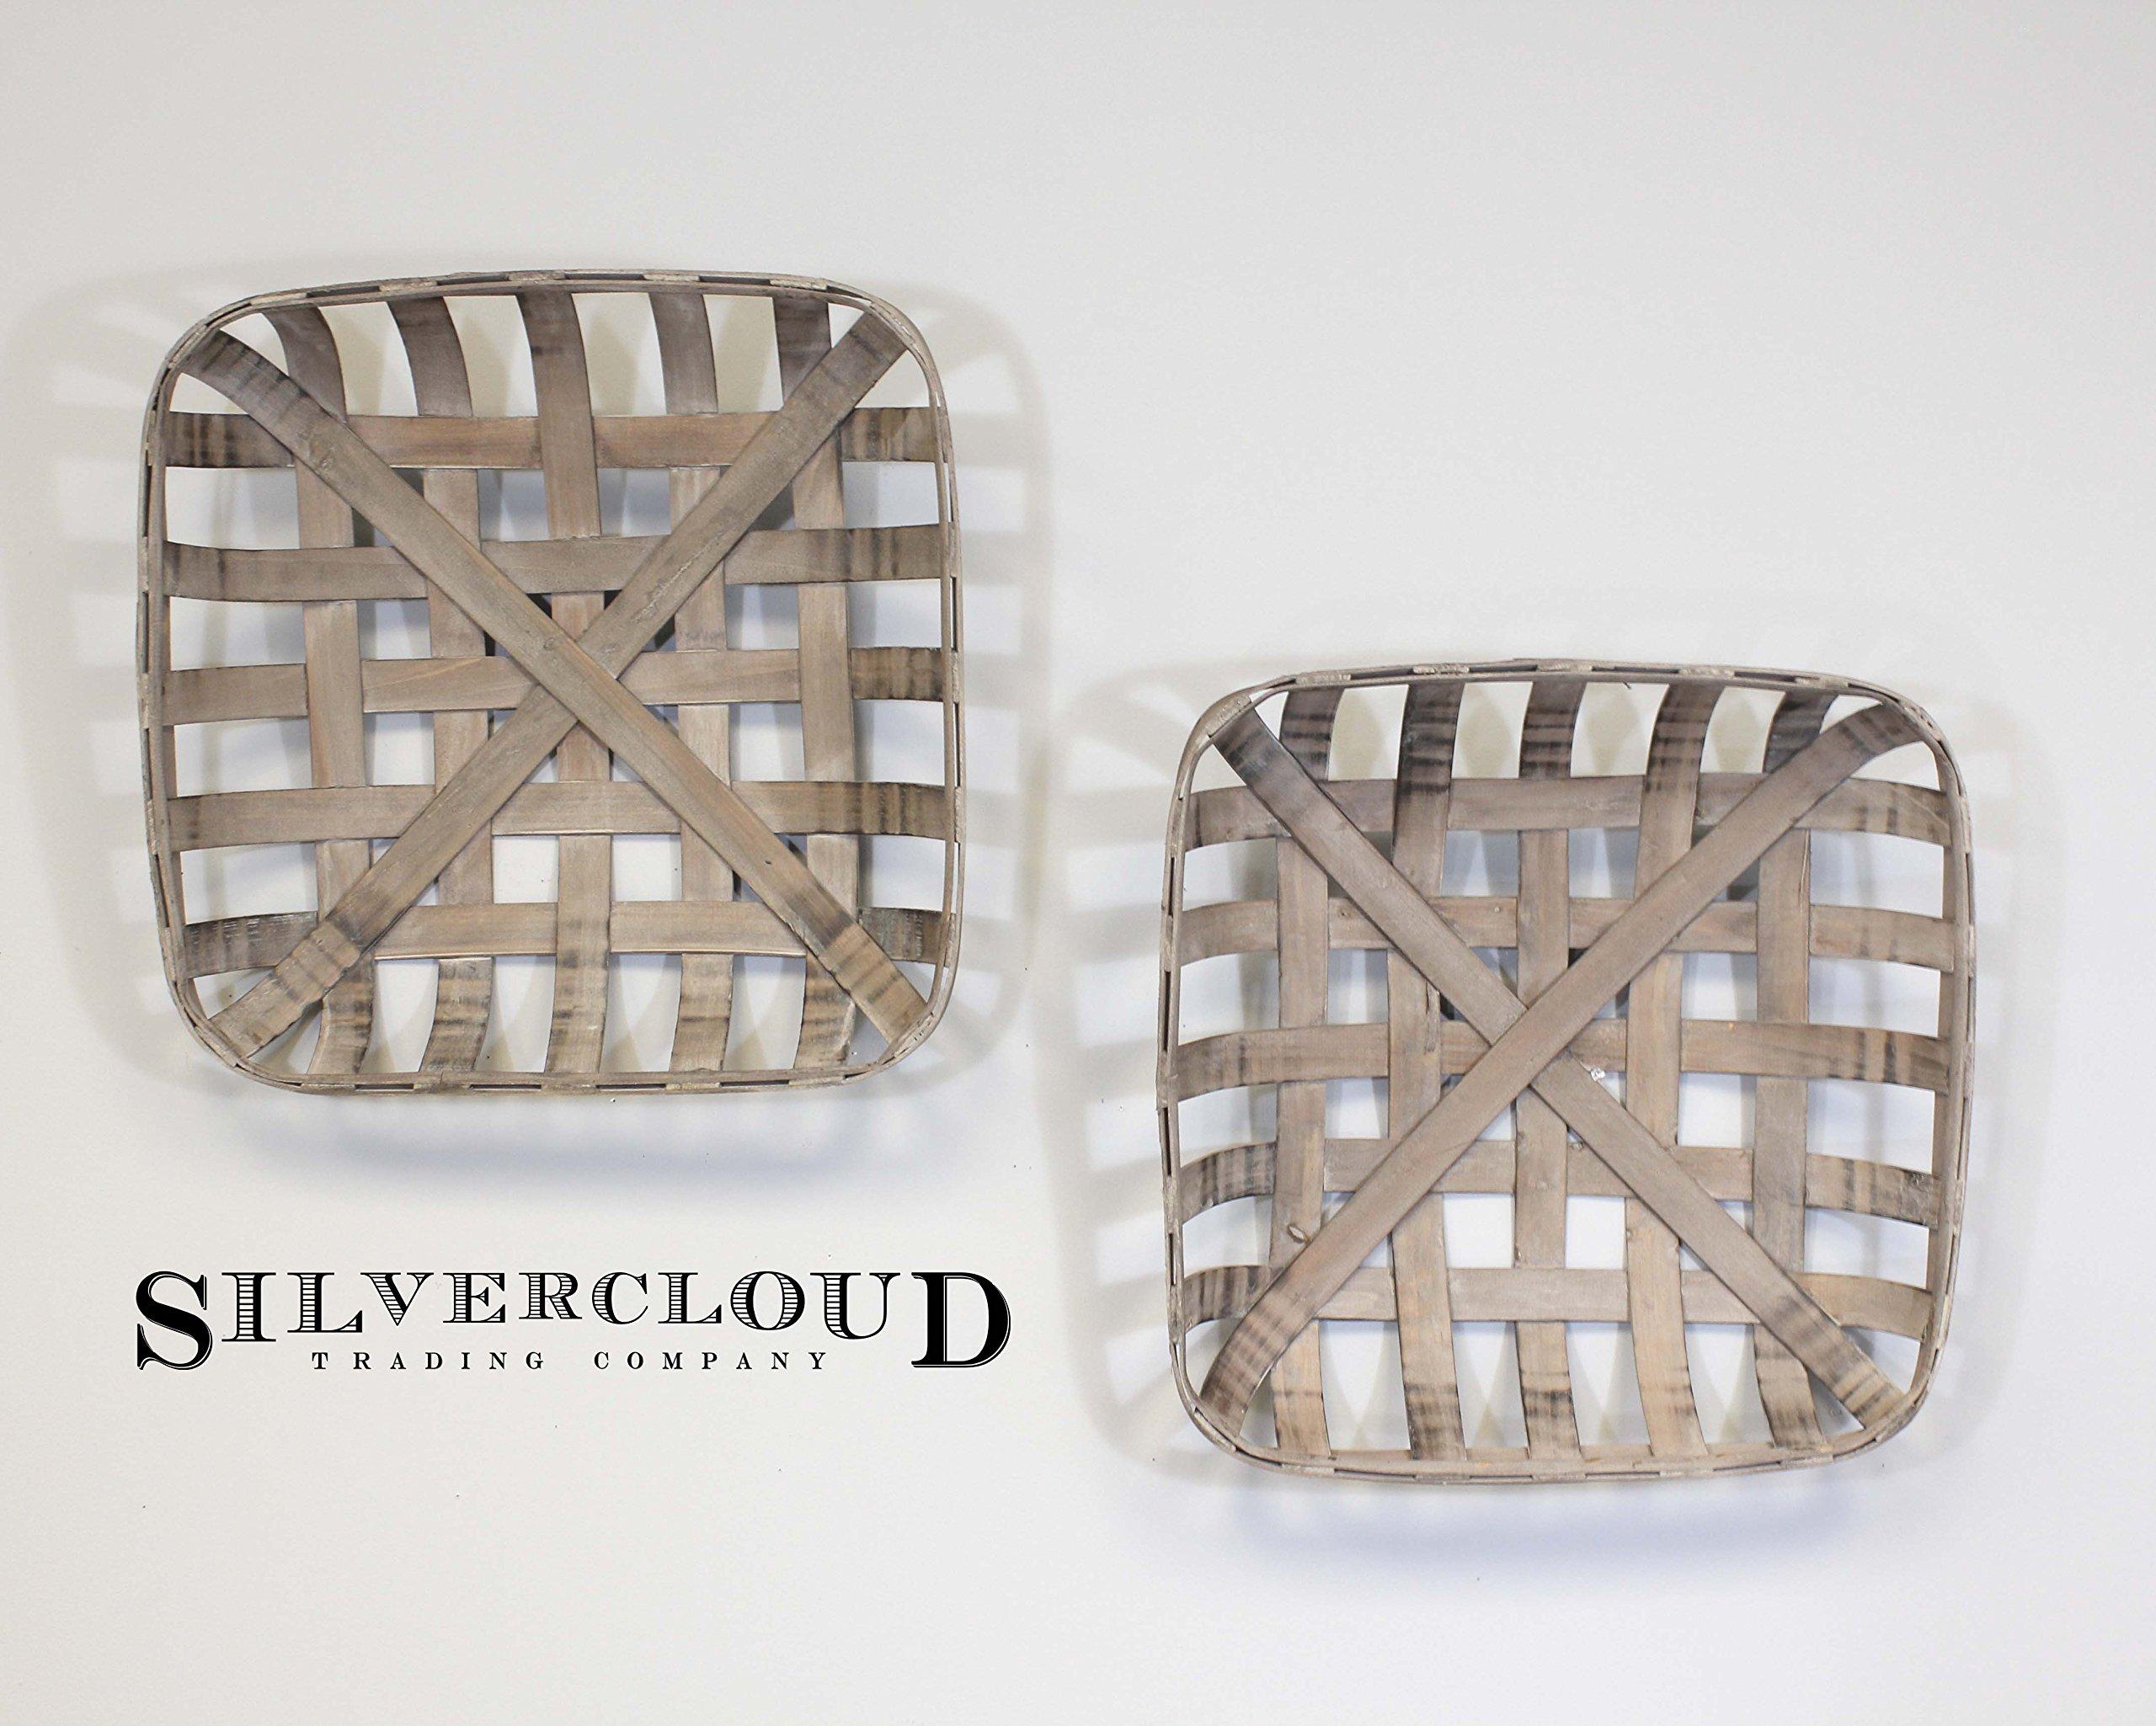 Silvercloud Trading Co. 2 Piece Set of Tobacco Baskets, Farmhouse Decor, Small 17'' Squares